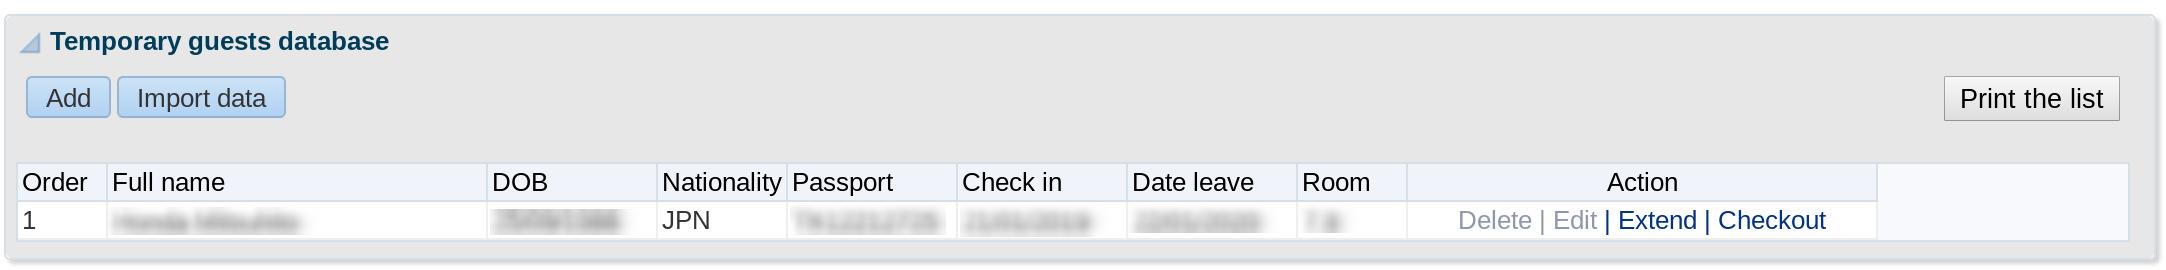 Foreigner Residential Registration Database:Temporary Guests Database